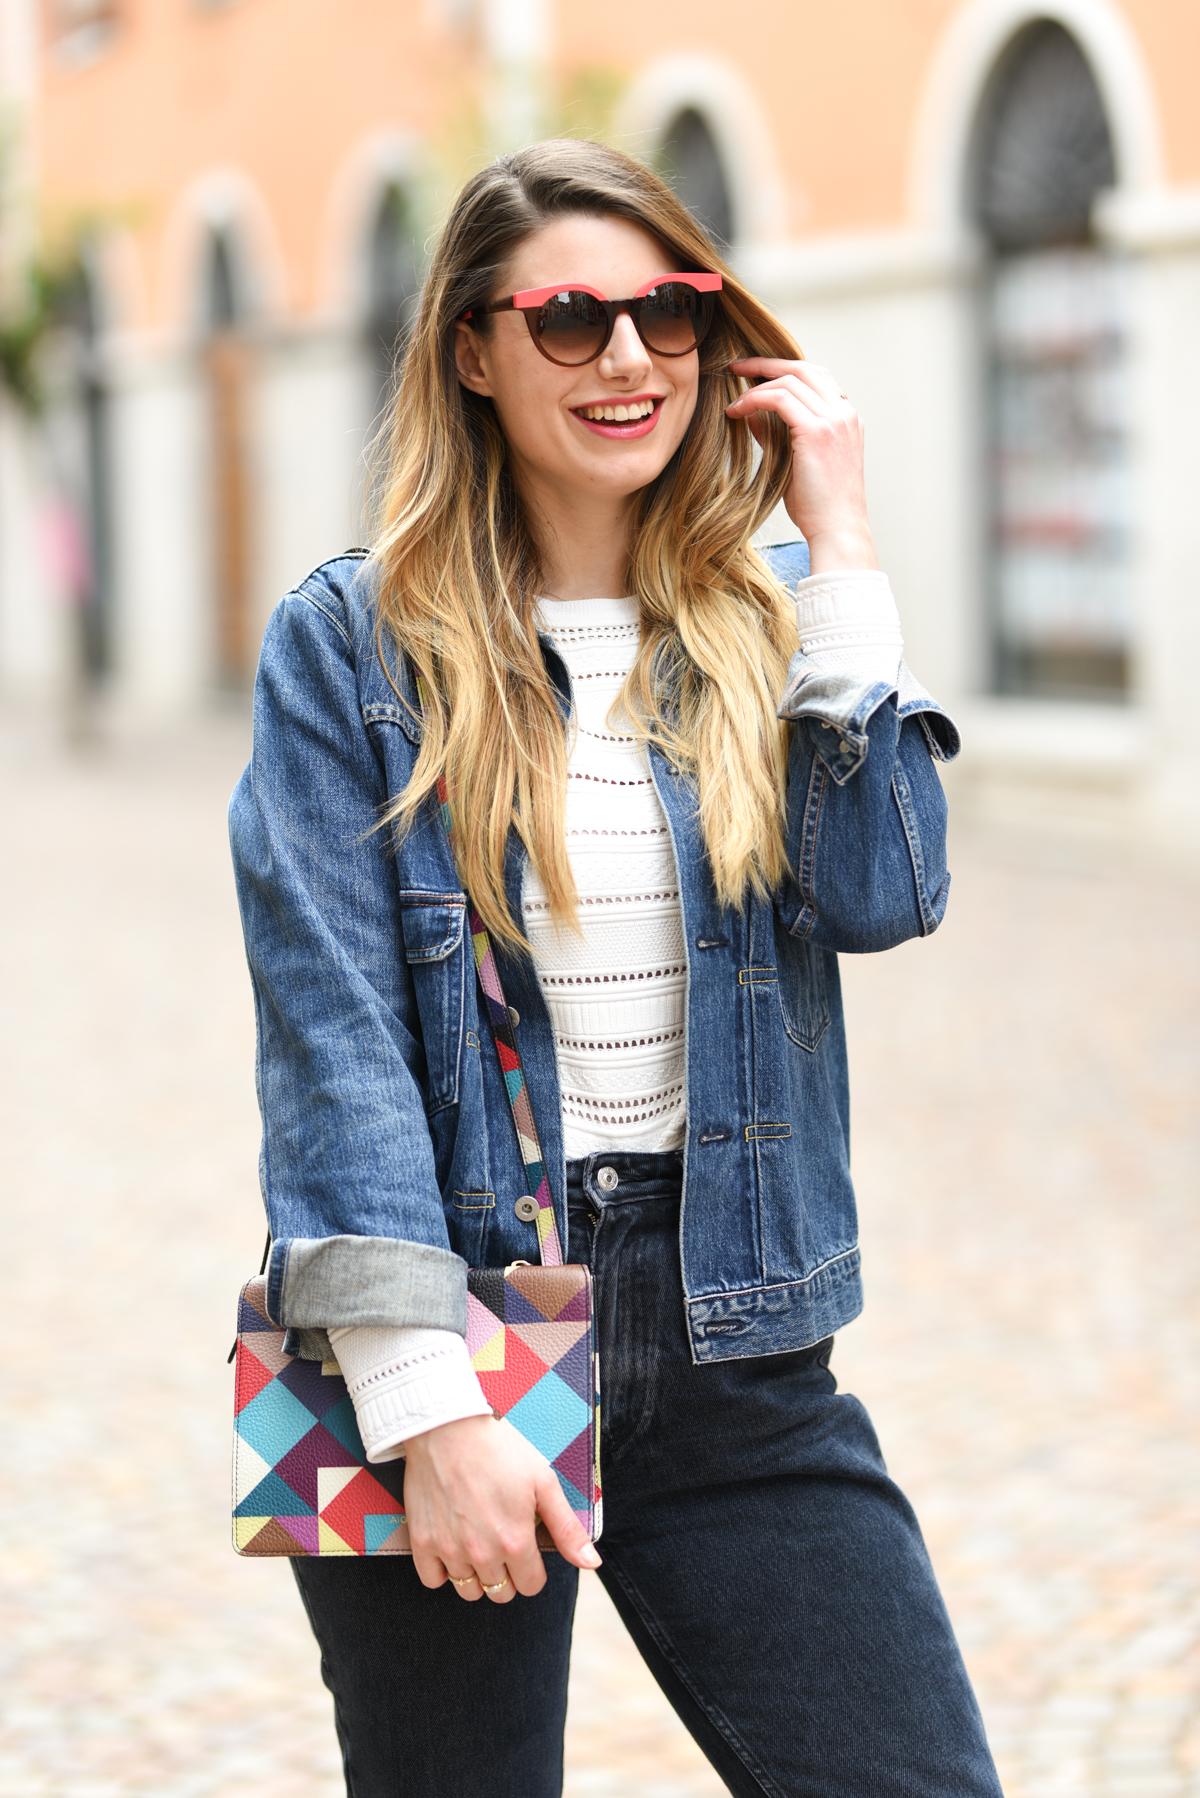 giulia de martin woow sunglasses occhiali da sole frame eyewear pink spring summer 2019 eyewear blog influencer -19